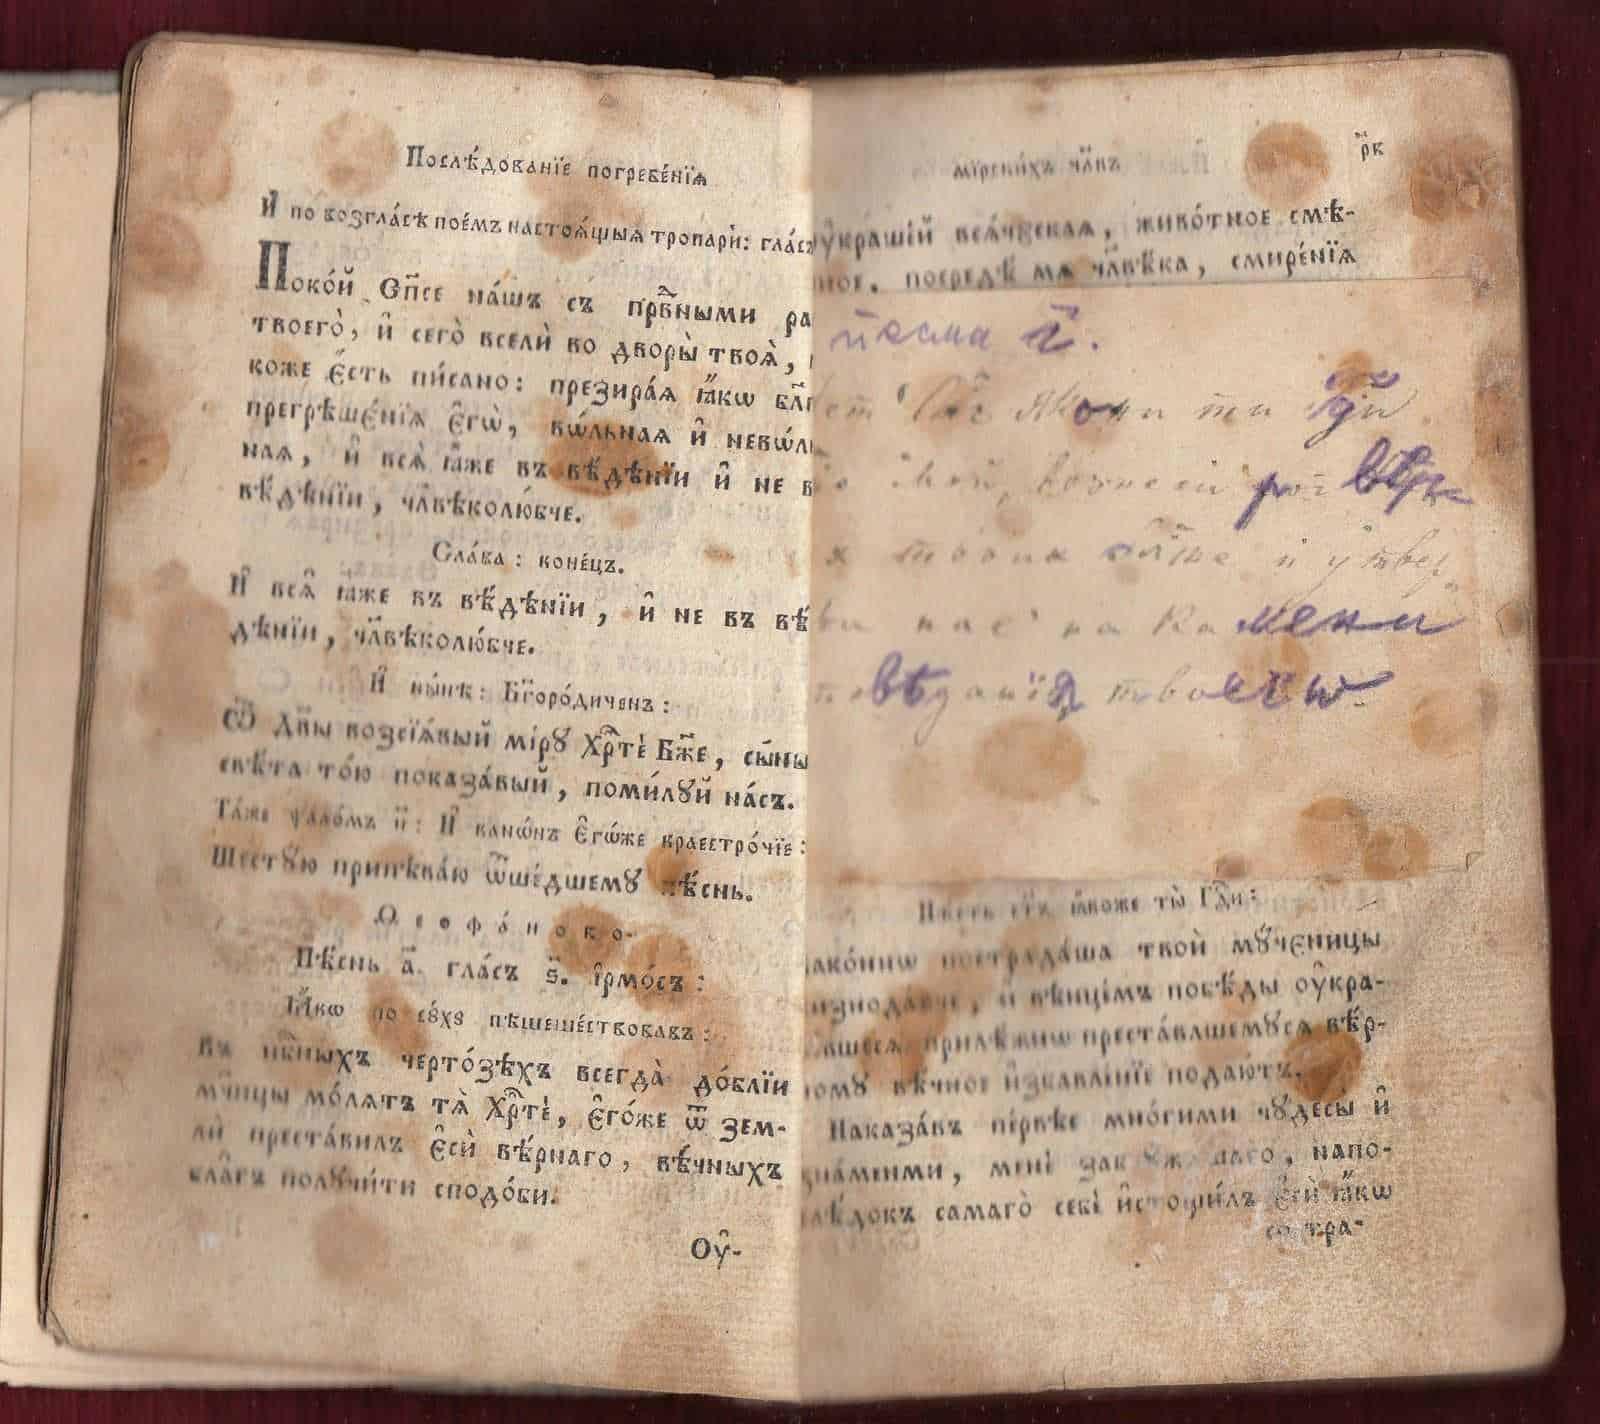 19c-Posledovanie-Acolouthia-e-Old-Slavonic-Inscribed-Manuscript-401146479031-3